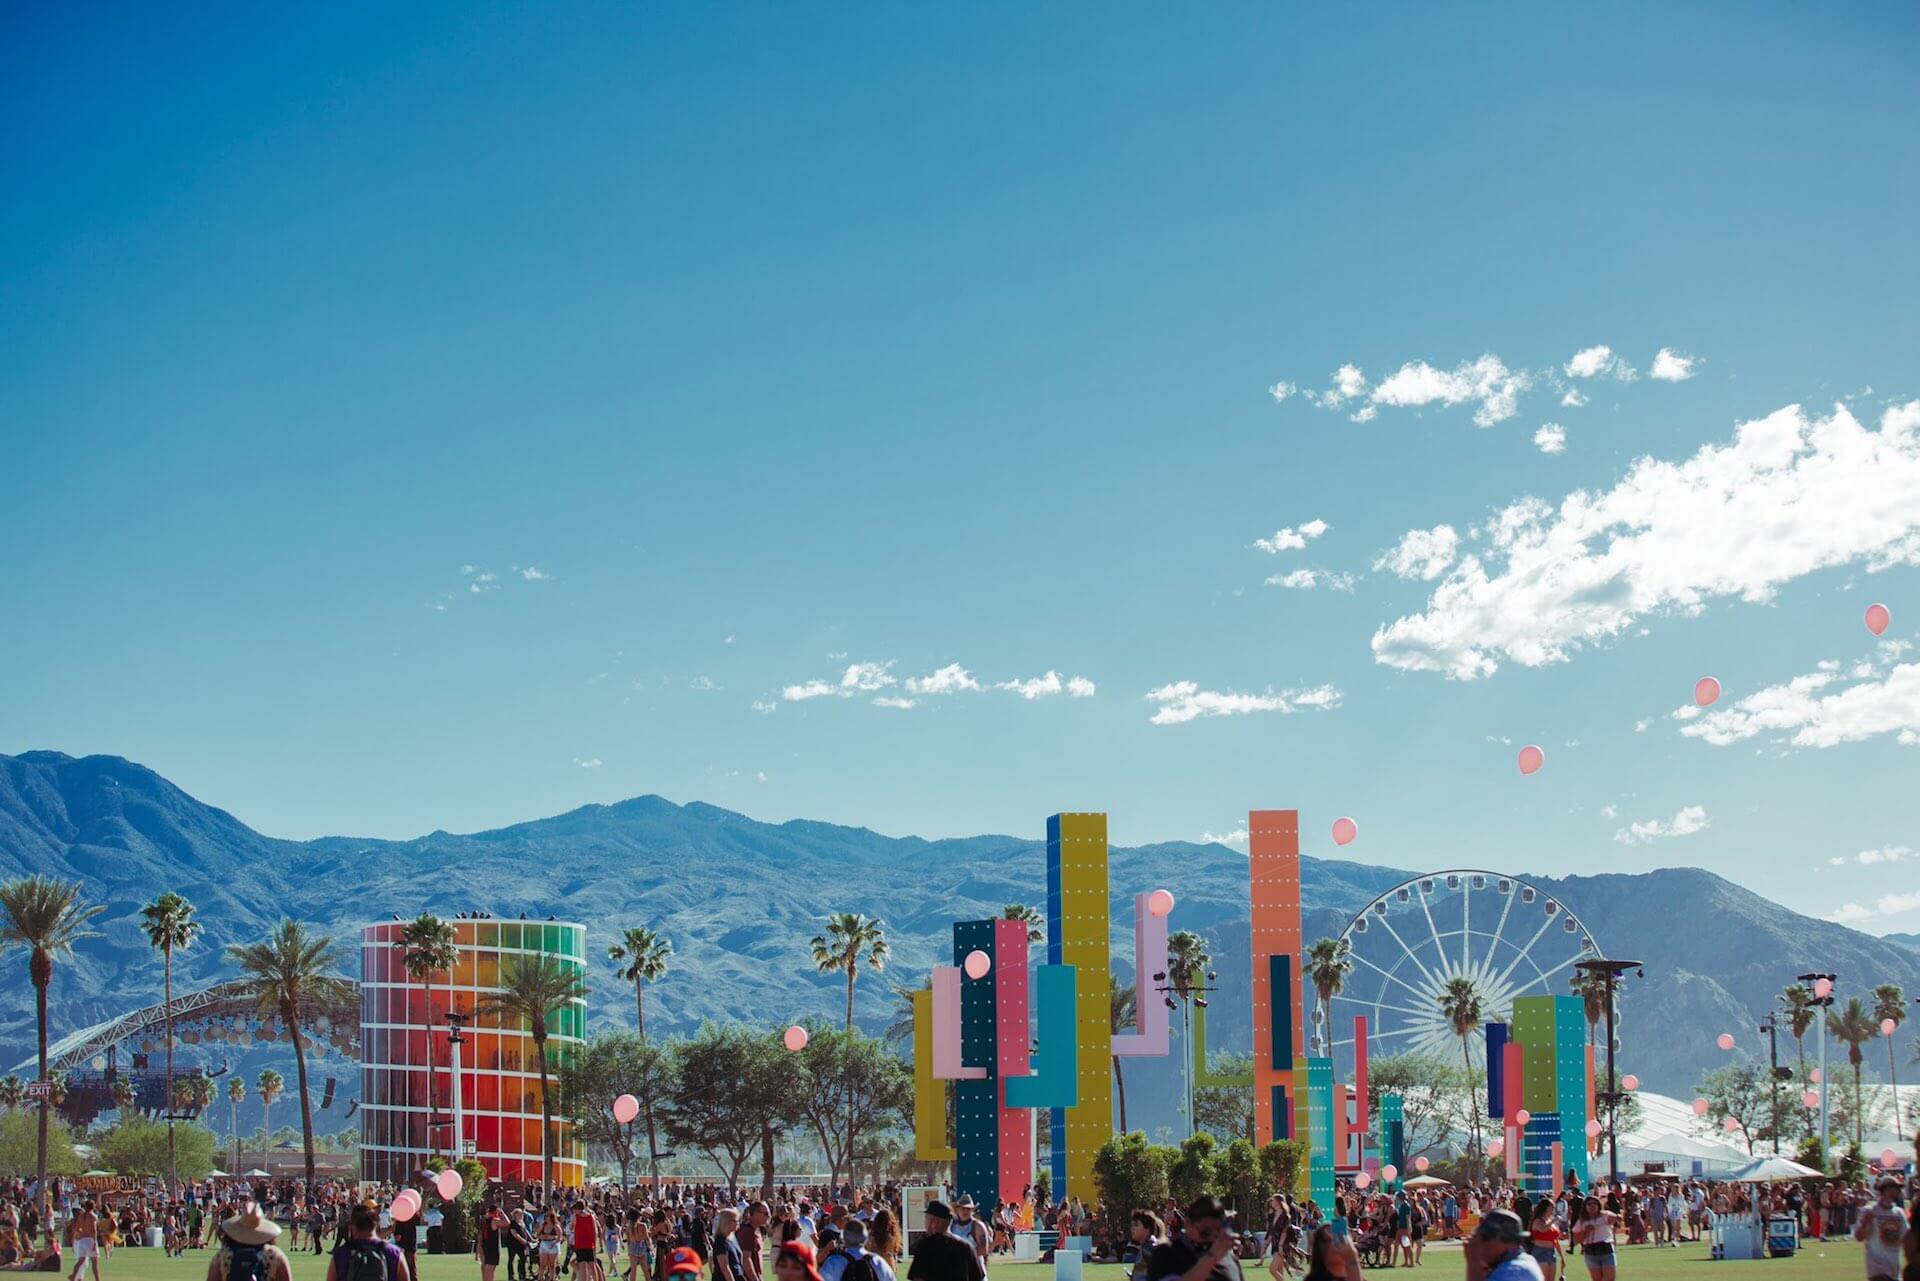 <Coachella 2020>、新型コロナウイルス感染症の影響により中止を発表 10月に延期を検討中 music200311_coachella_main